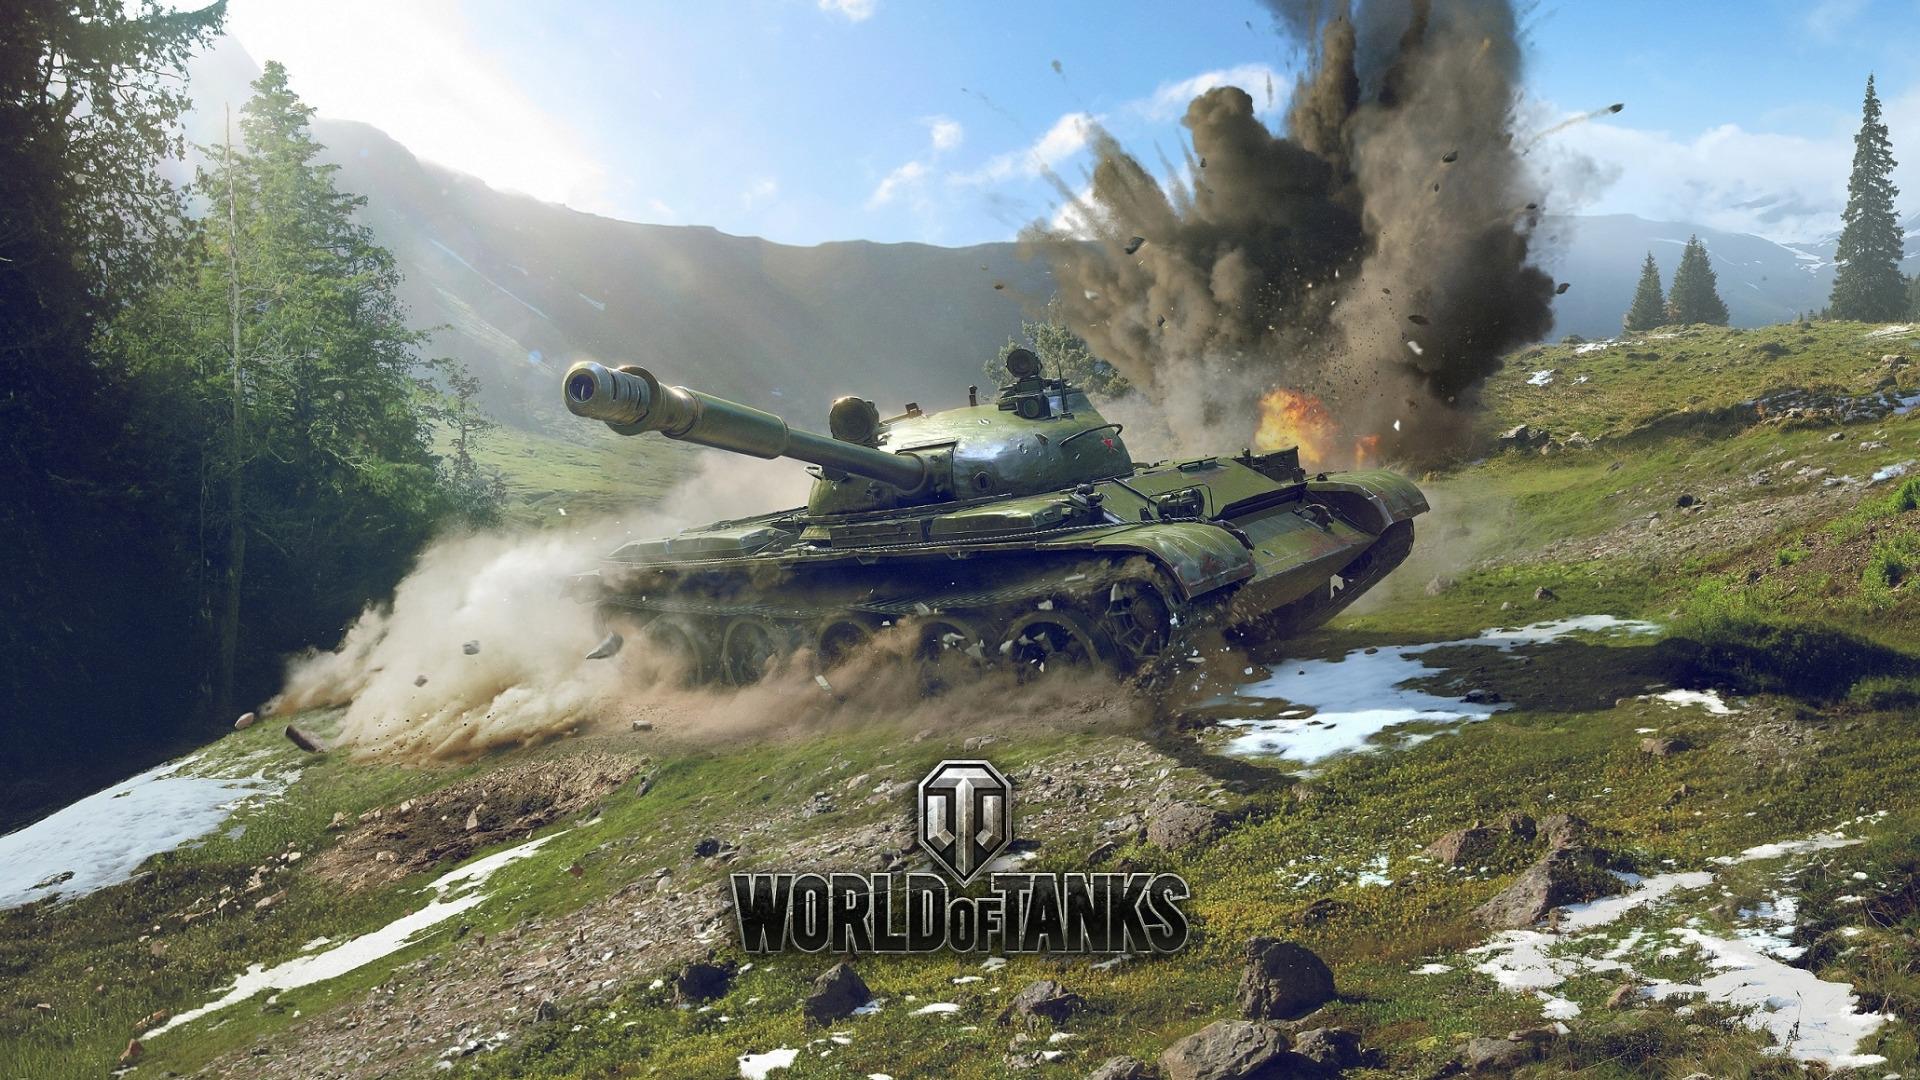 Hltv world of tanks cs go no steam не заходит на сервера